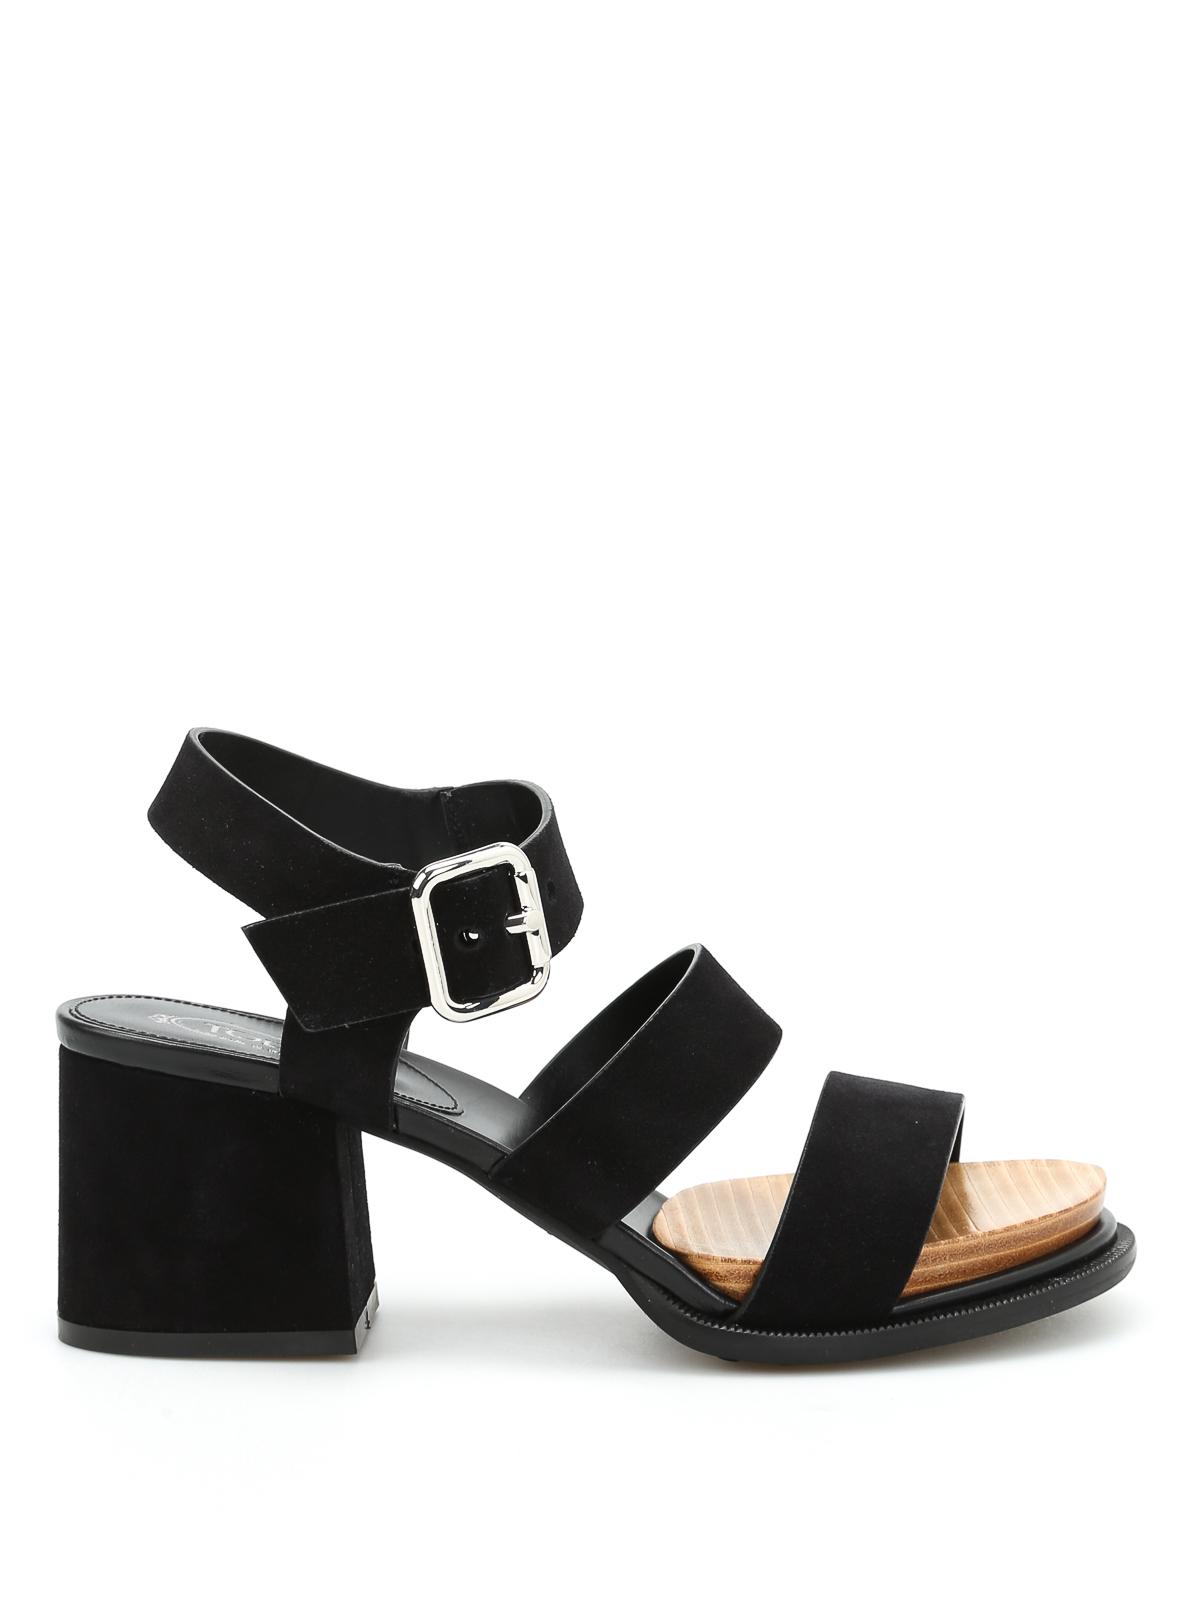 Calvin KleinSATAY - Lace-ups - black VpqX7i